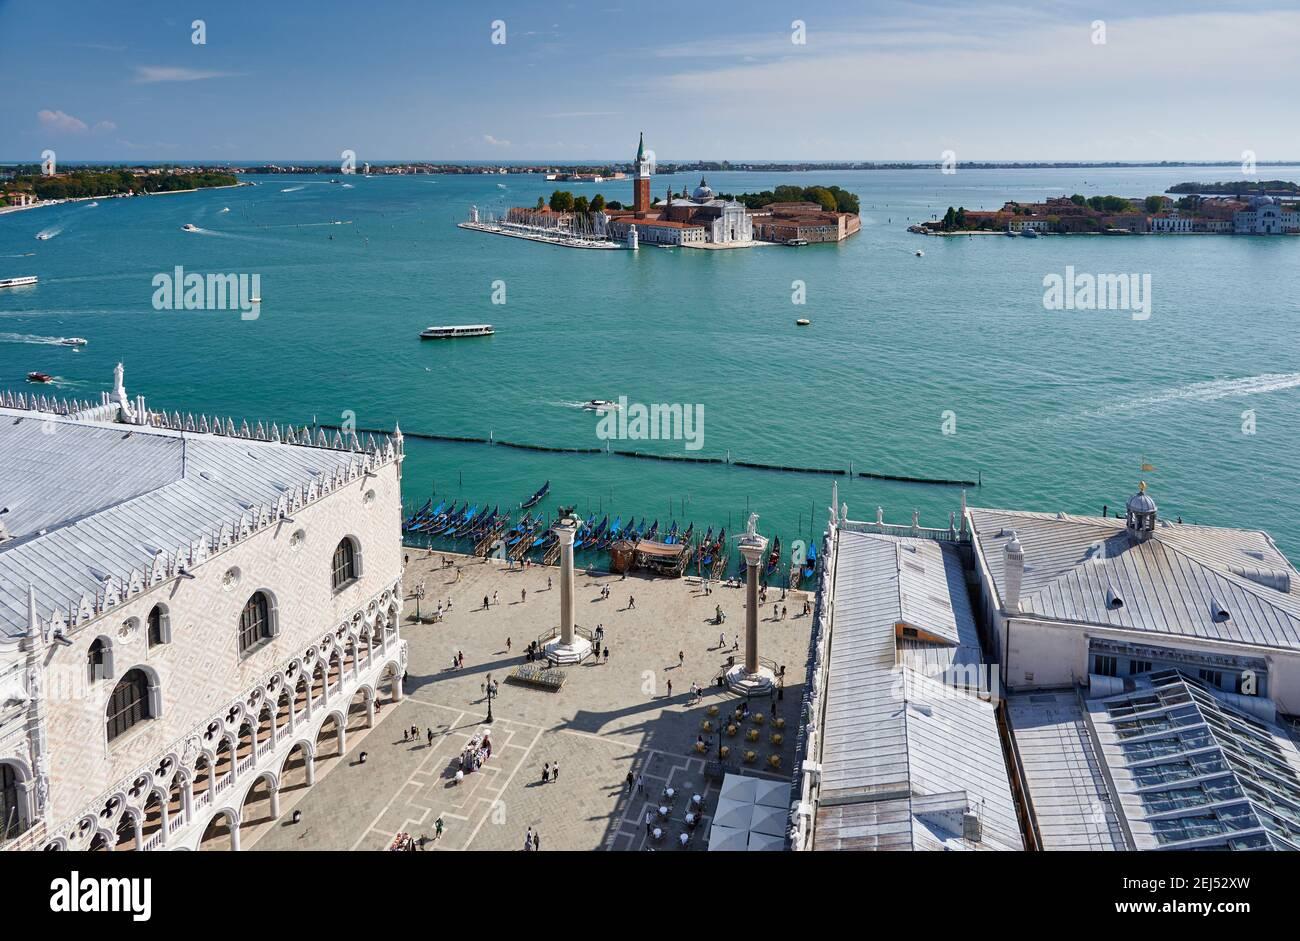 Aerial views from St. Mark's Tower on San Giorgio Maggiore and the Venice lagoon, Veneto, Italy Stock Photo